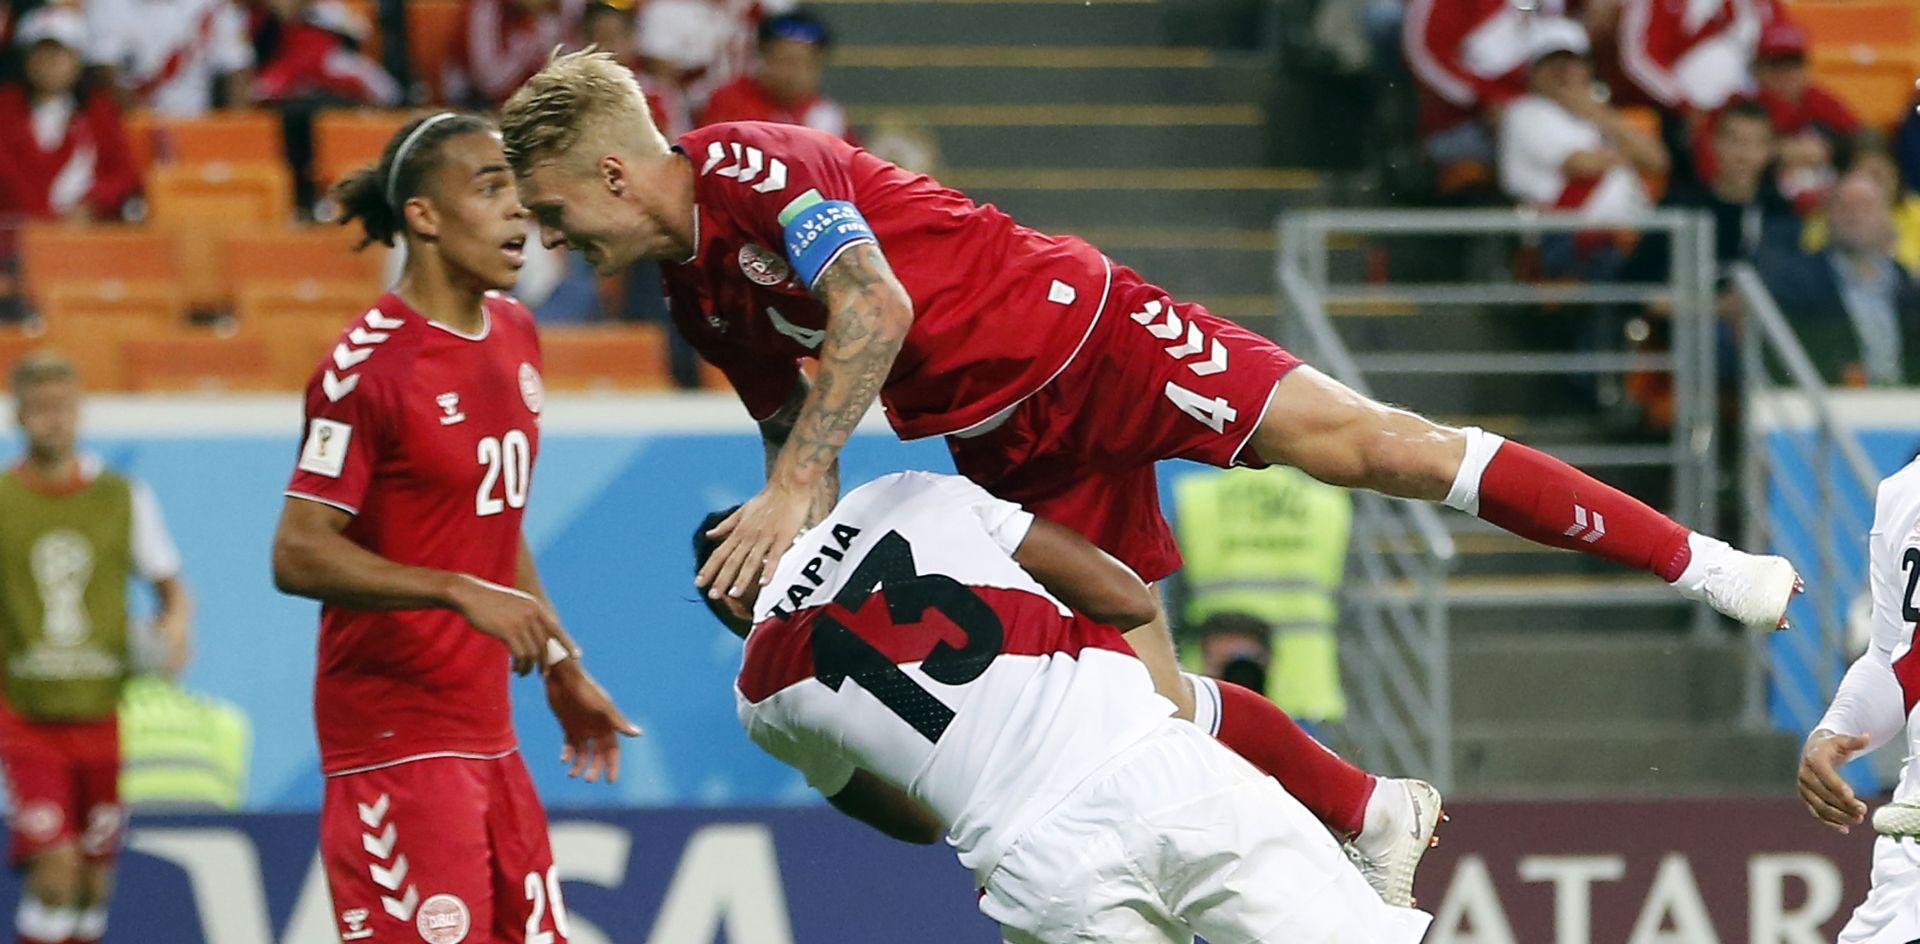 Danska minimalno slavila protiv Perua